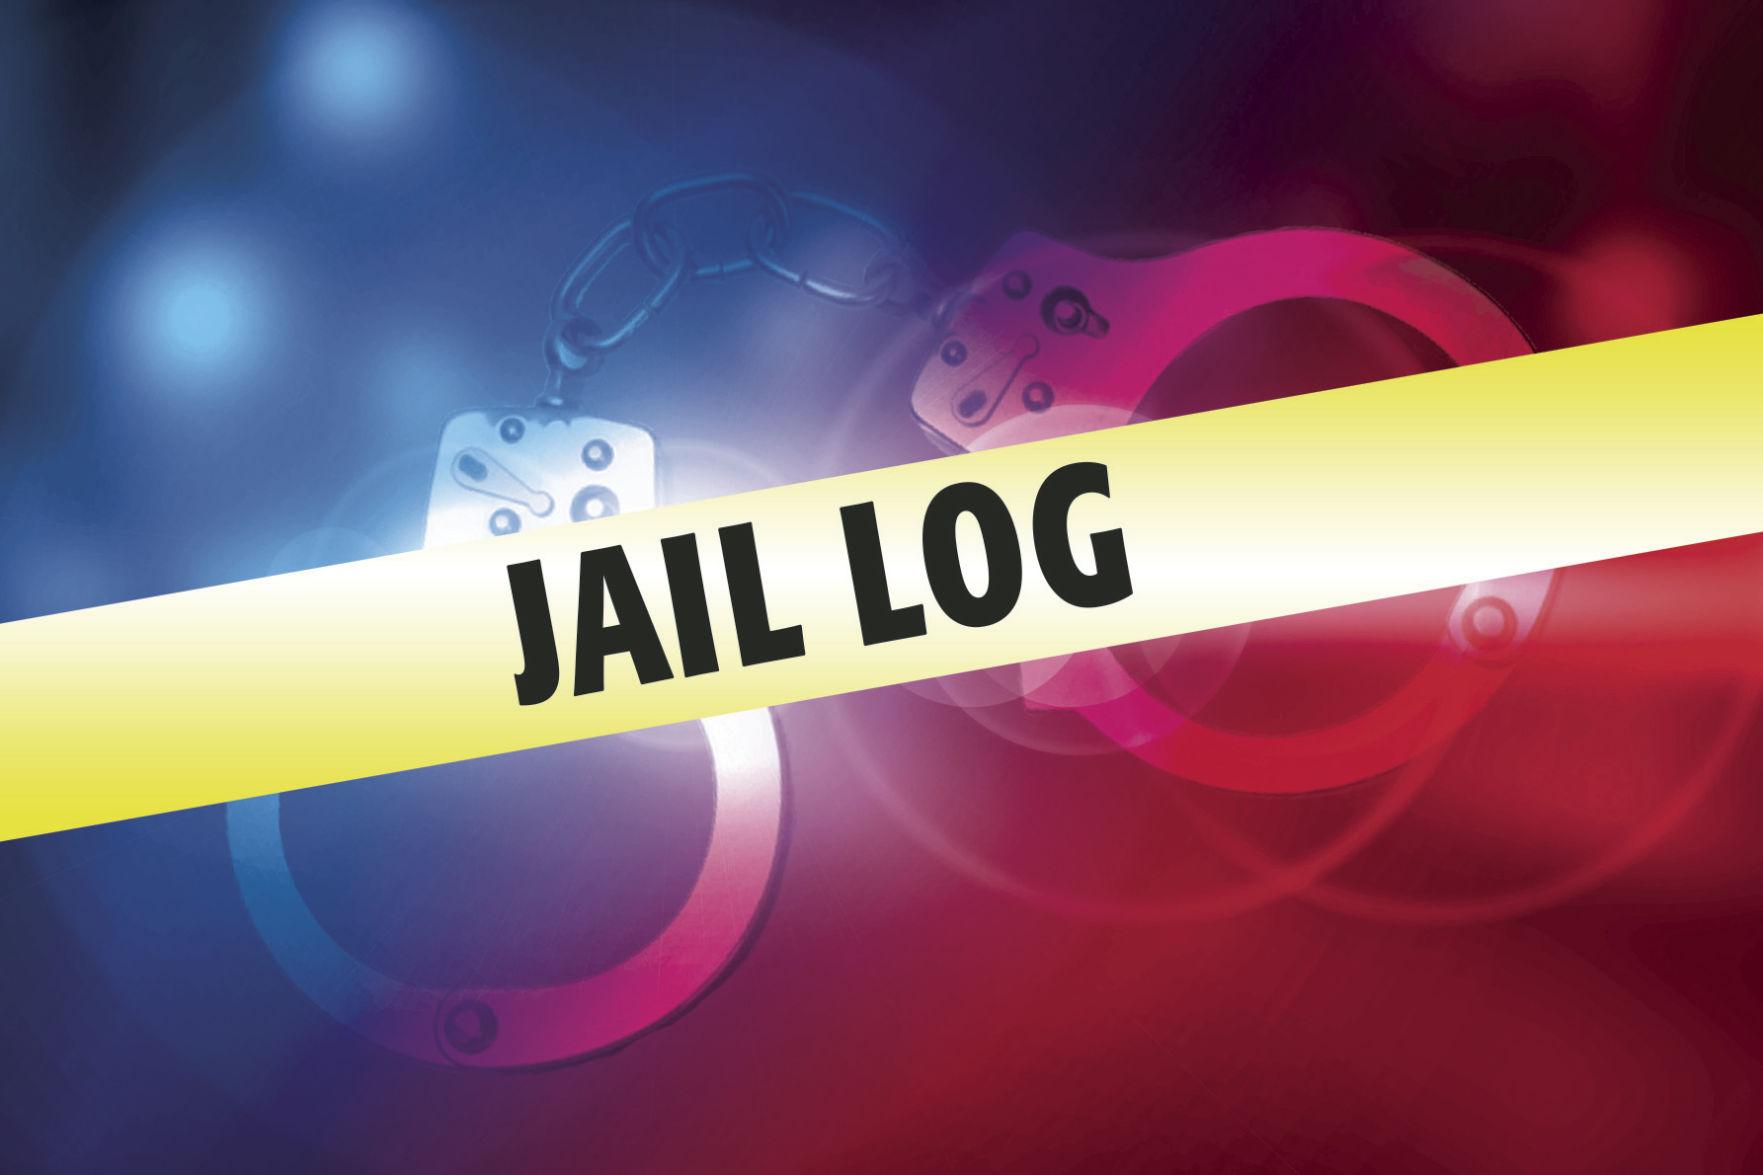 margaret harris arrest record indiana free